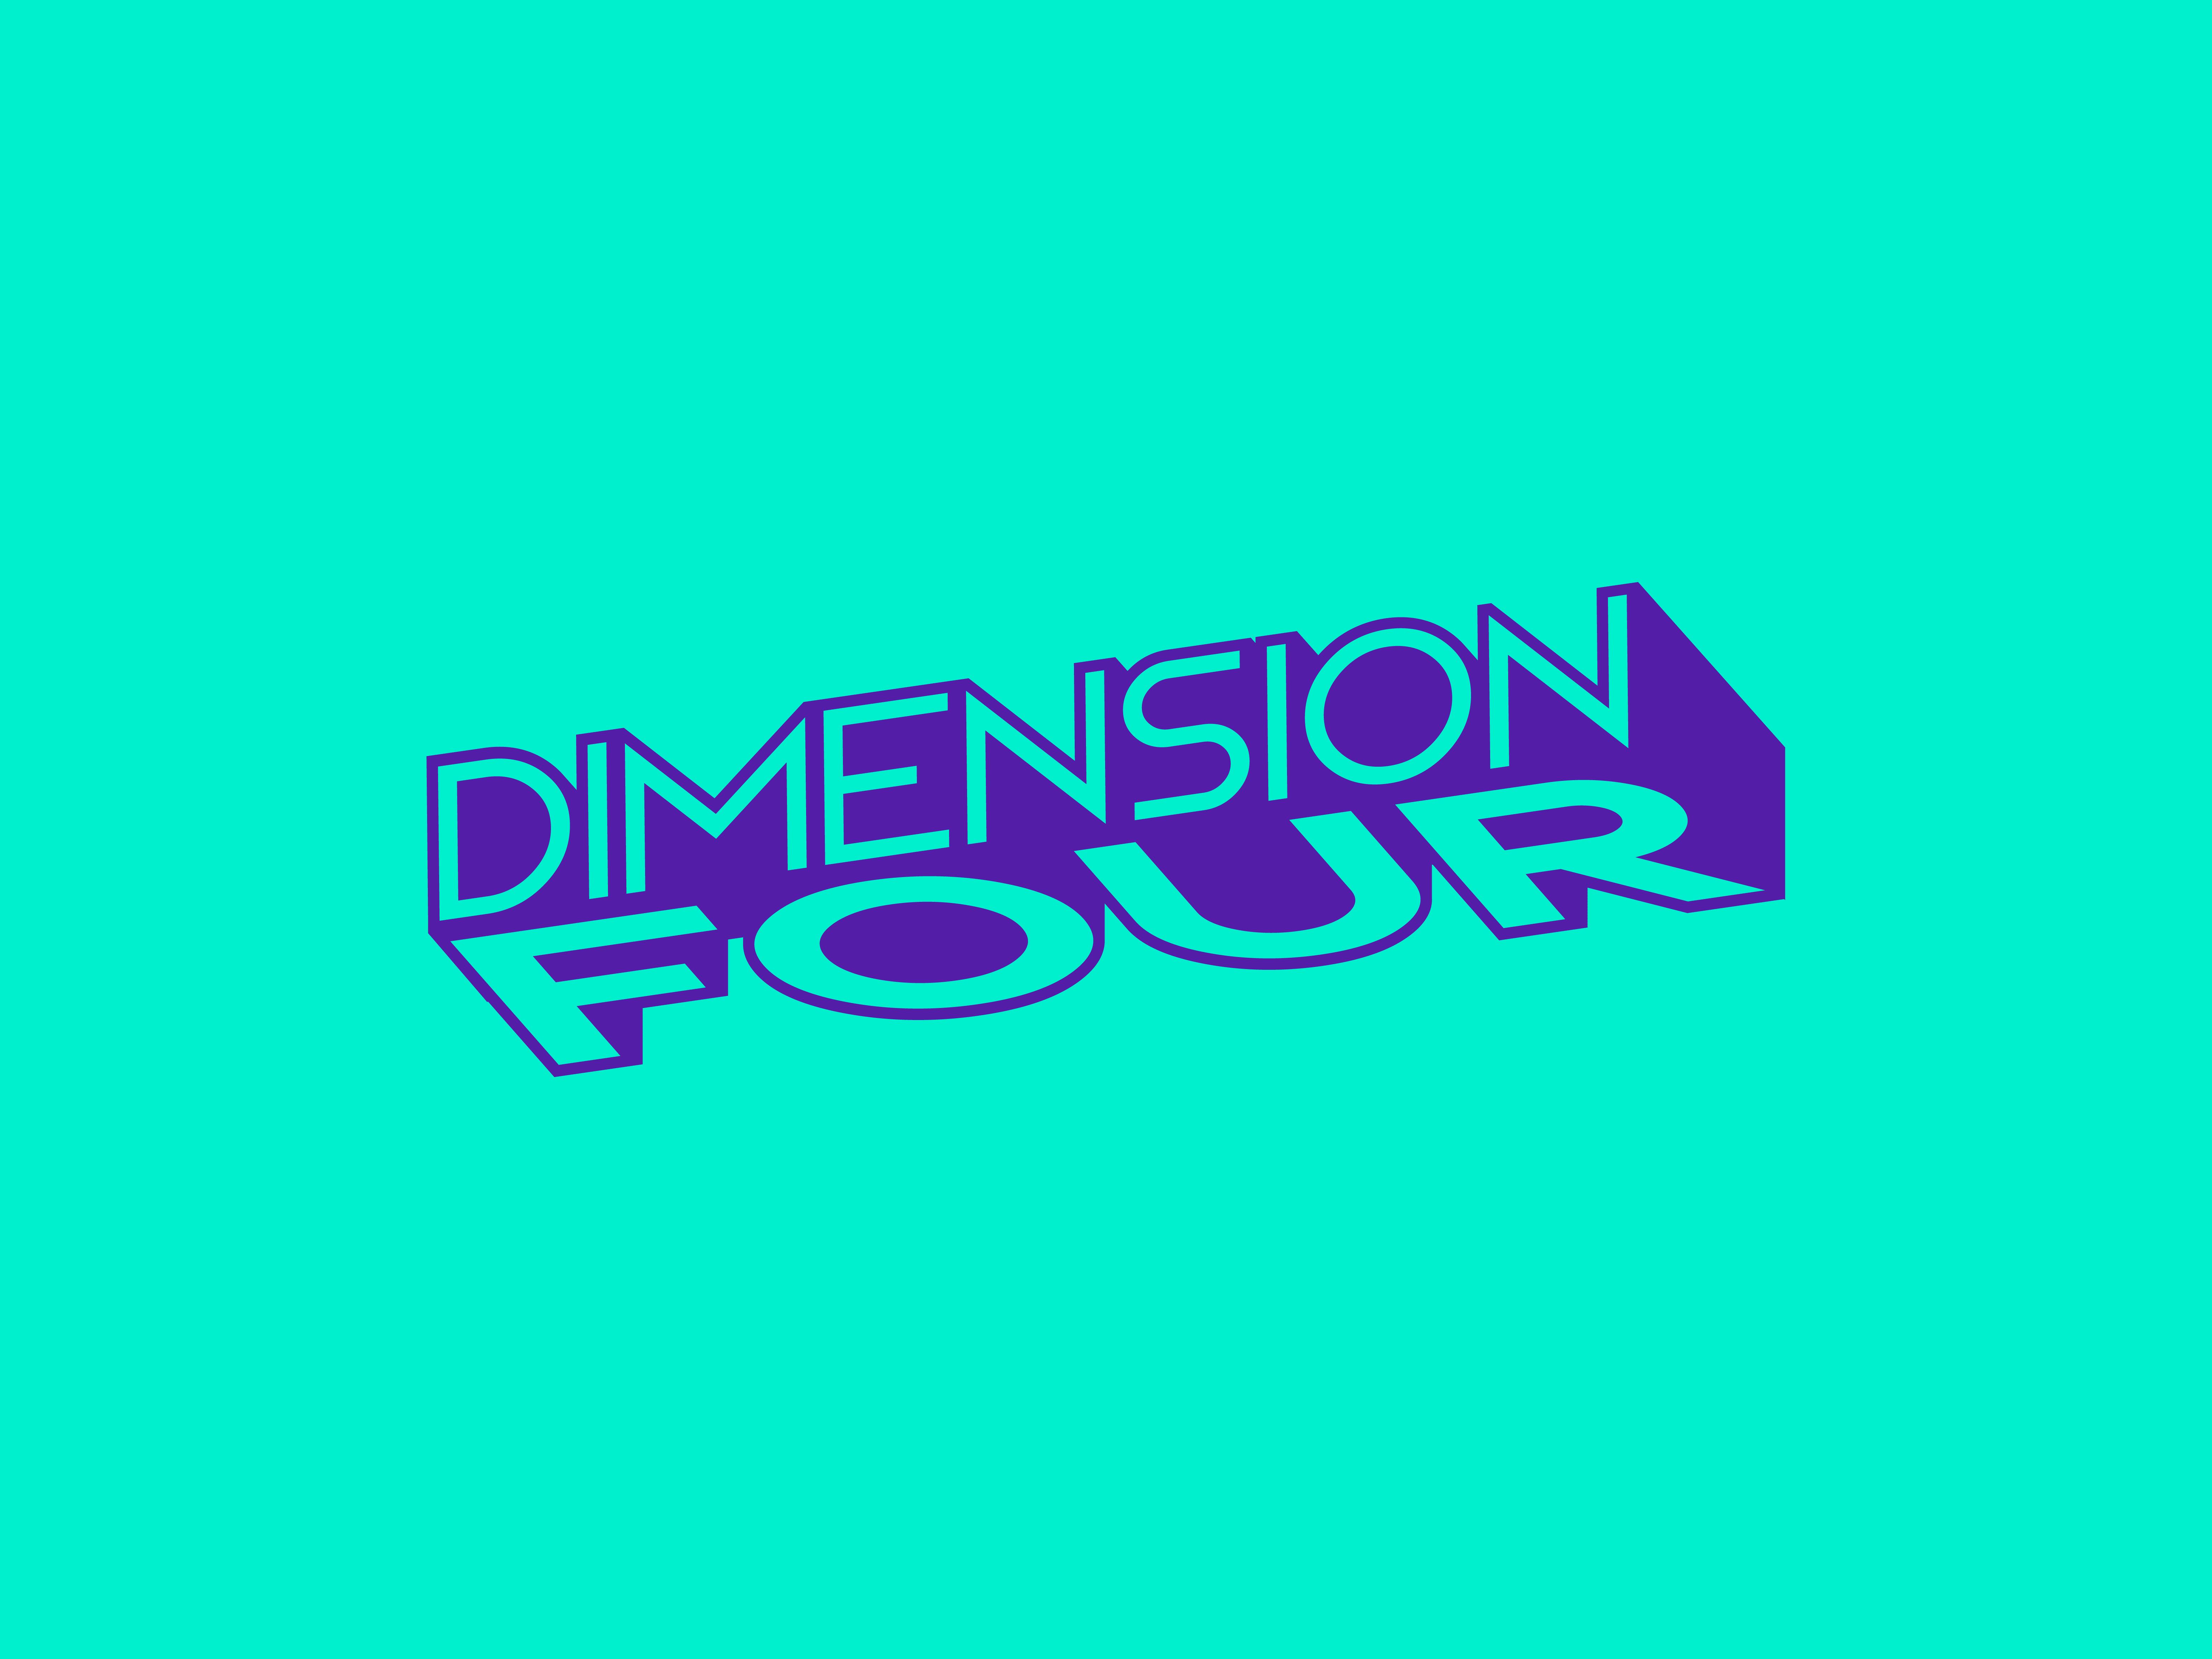 Dimension Four Identity